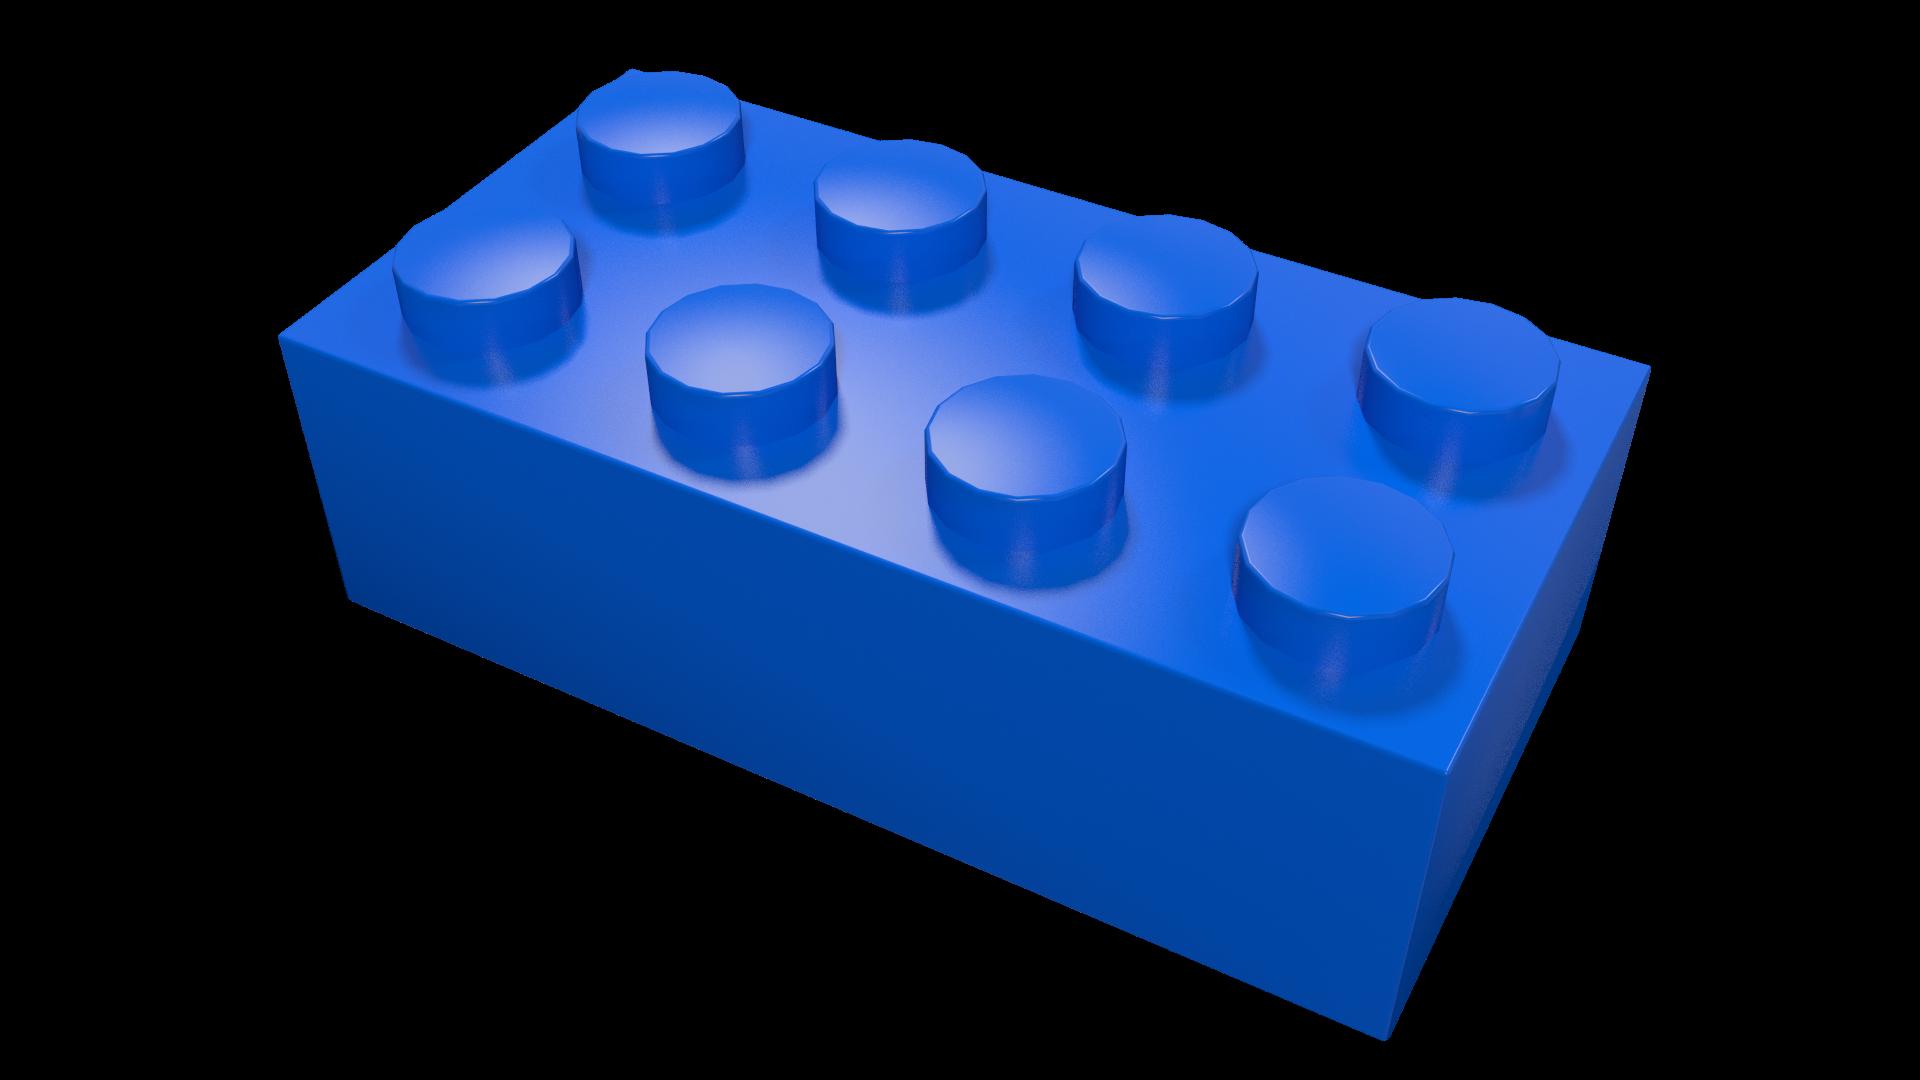 Legos clipart clear. Lego blocks free download